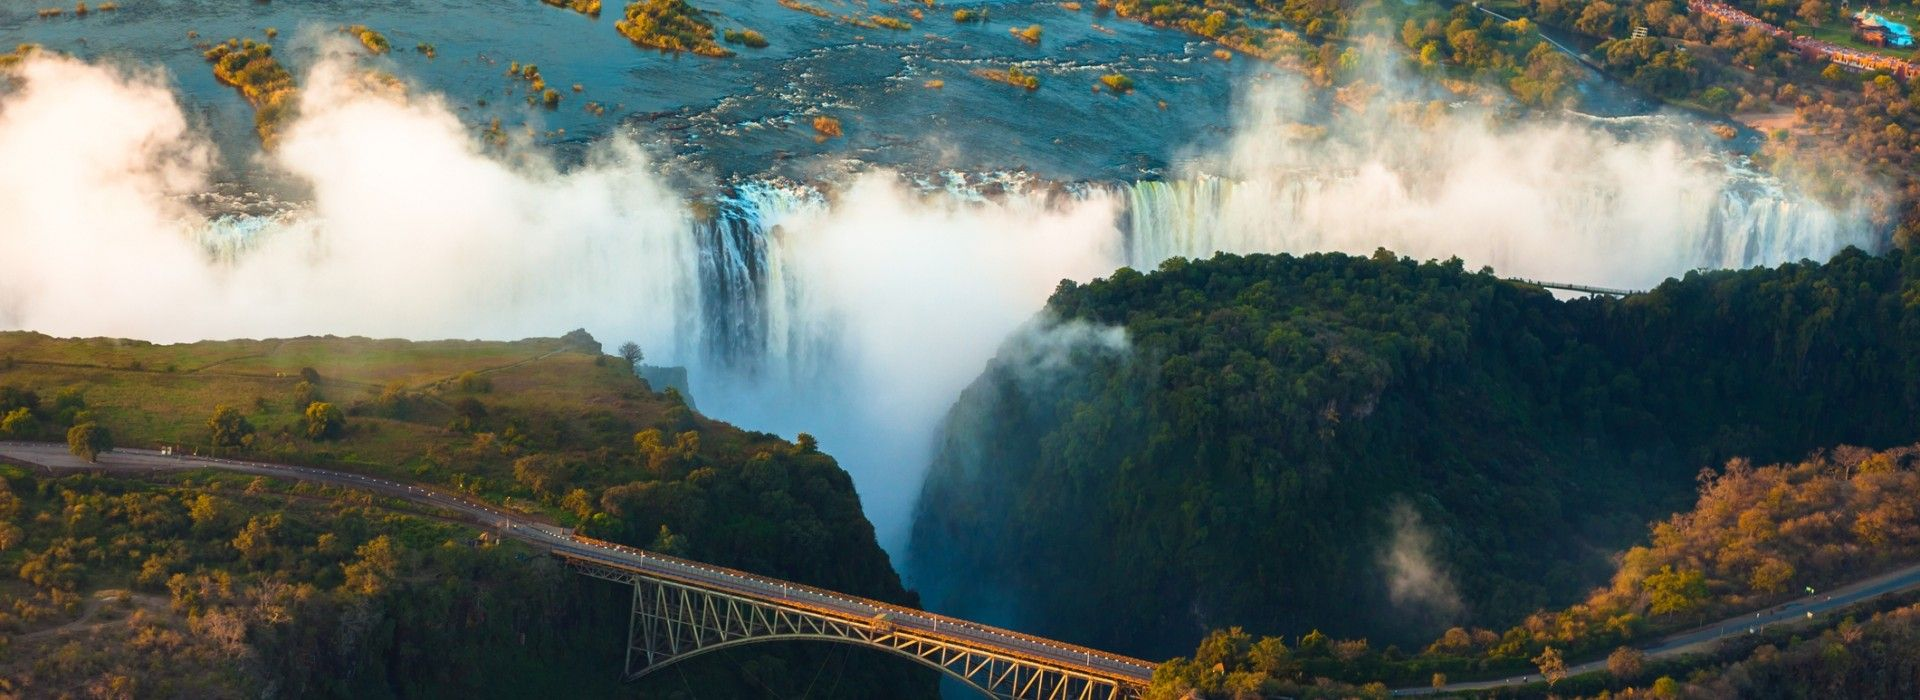 Explorer Tours in Zambia